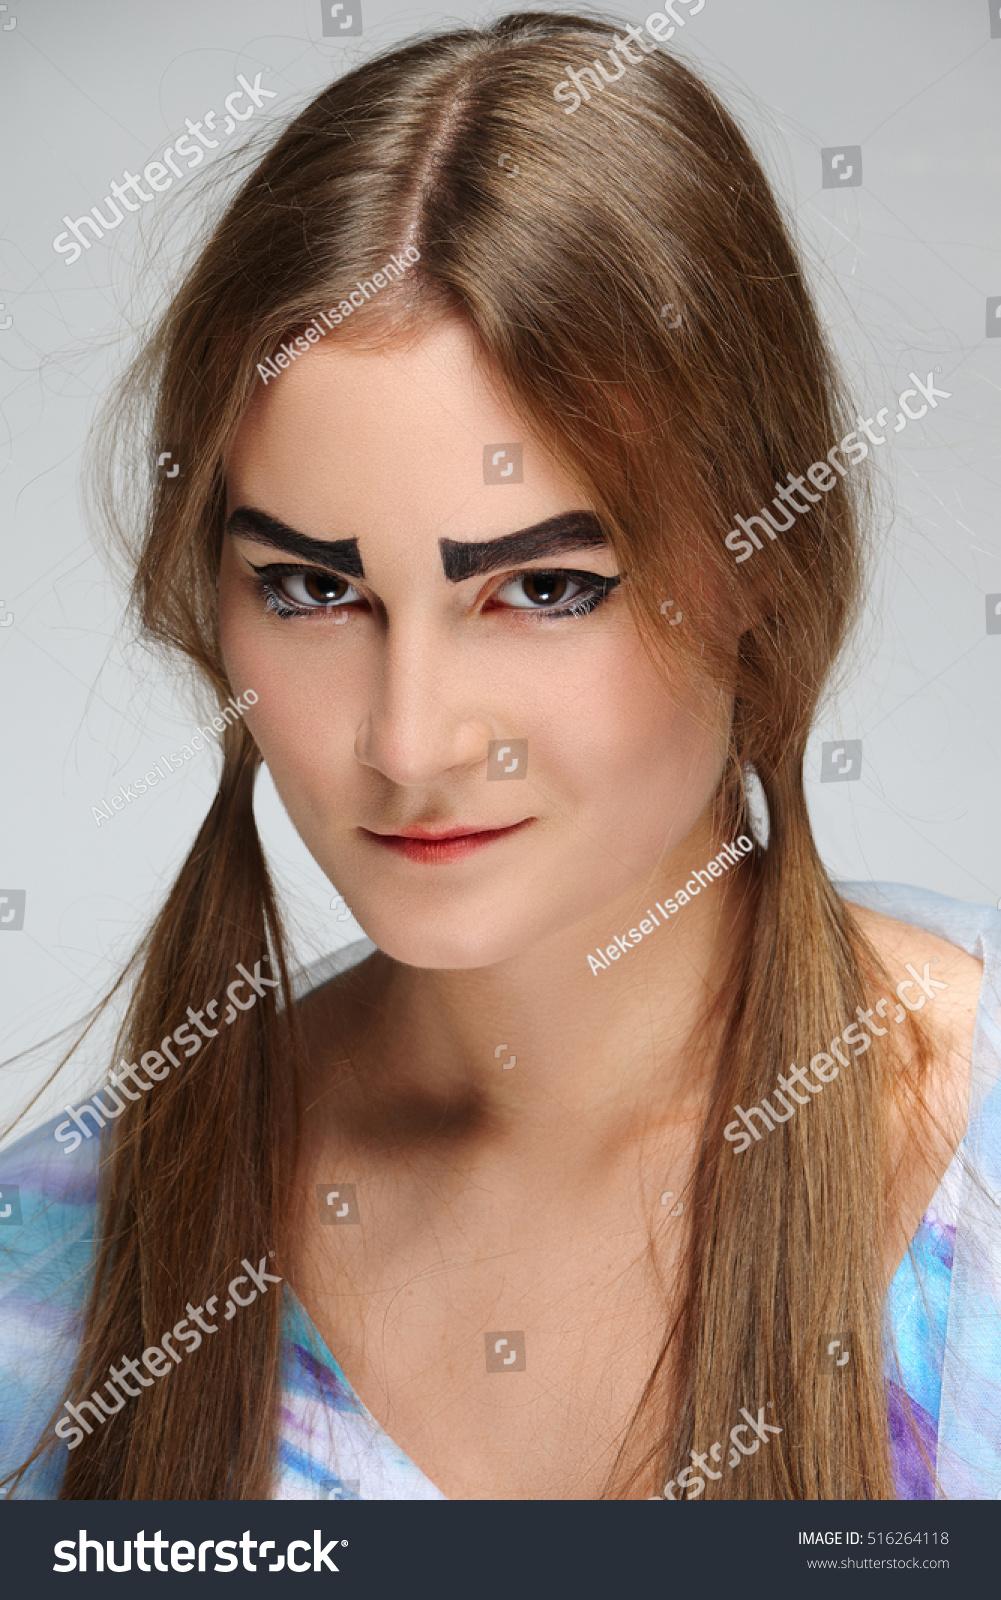 Girl Bushy Eyebrows Pigtails Hippie Dress Stock Photo Edit Now